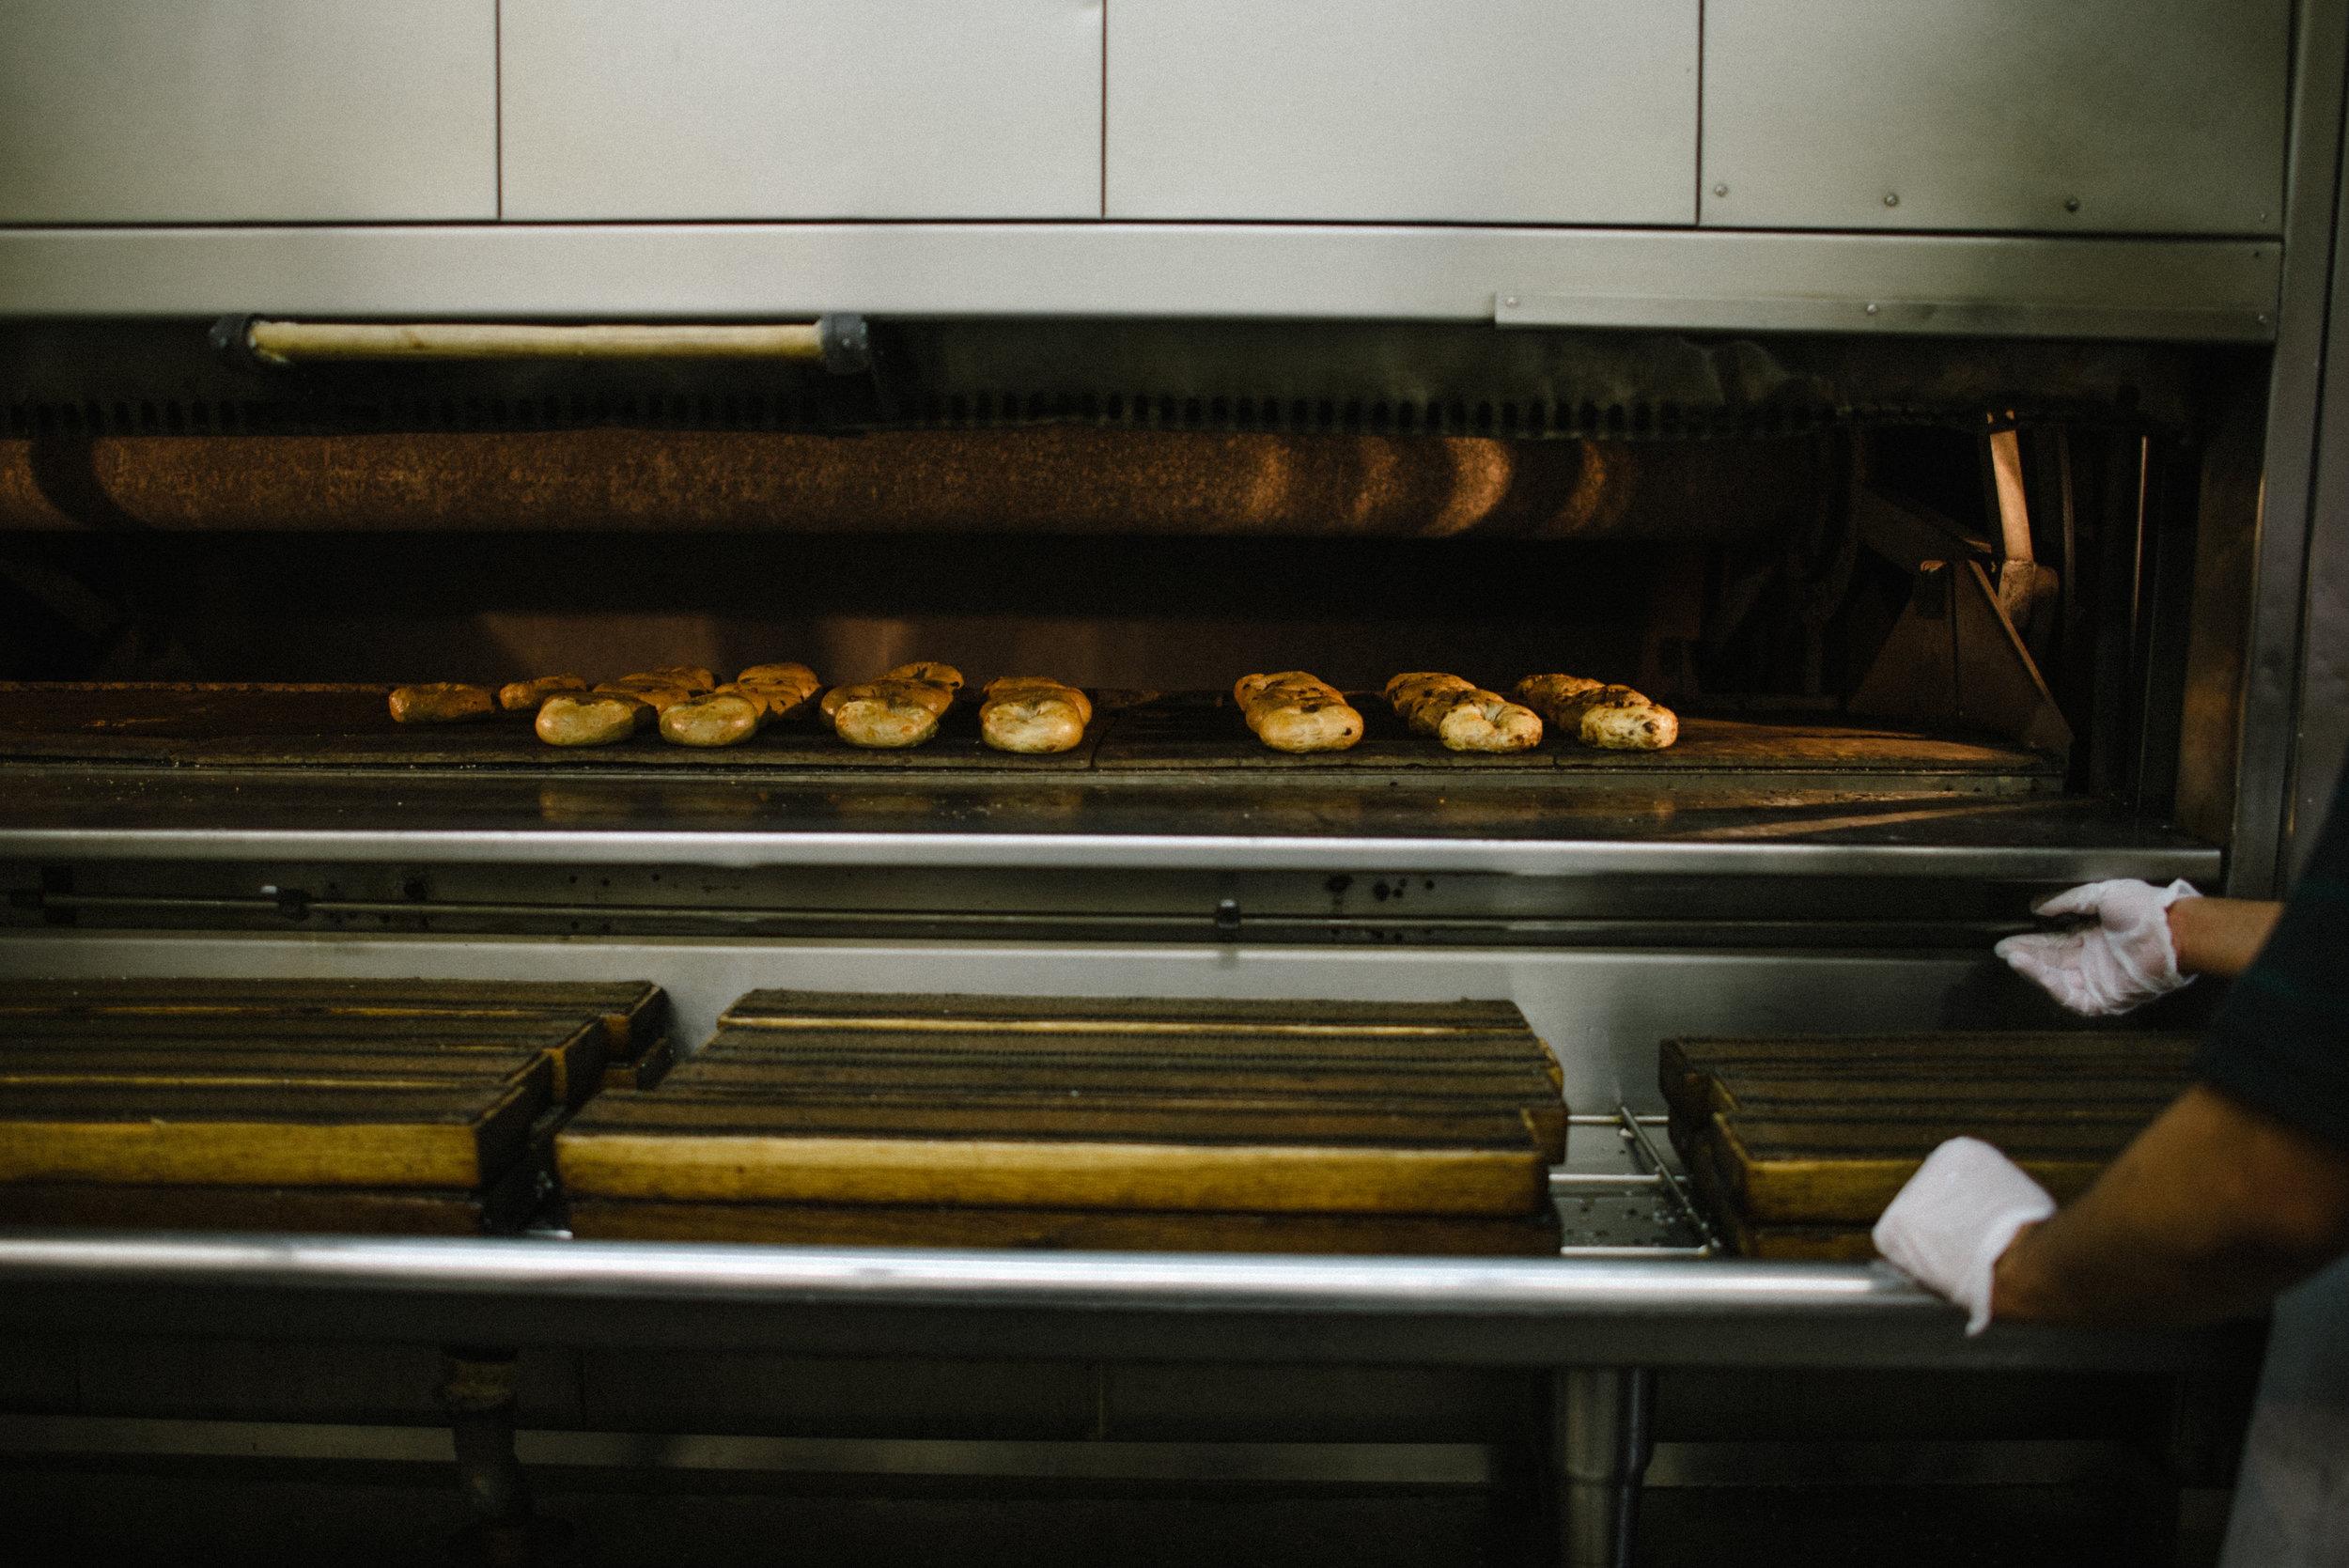 bagle shop-5199.jpg